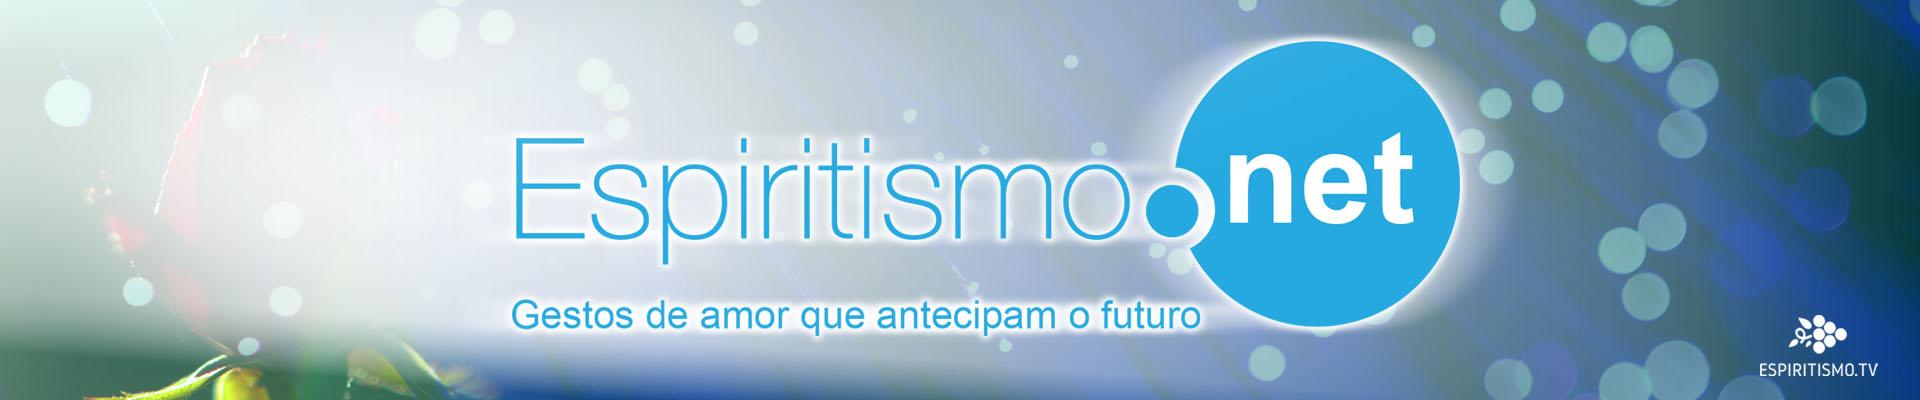 ESPIRITISMO.NET 1